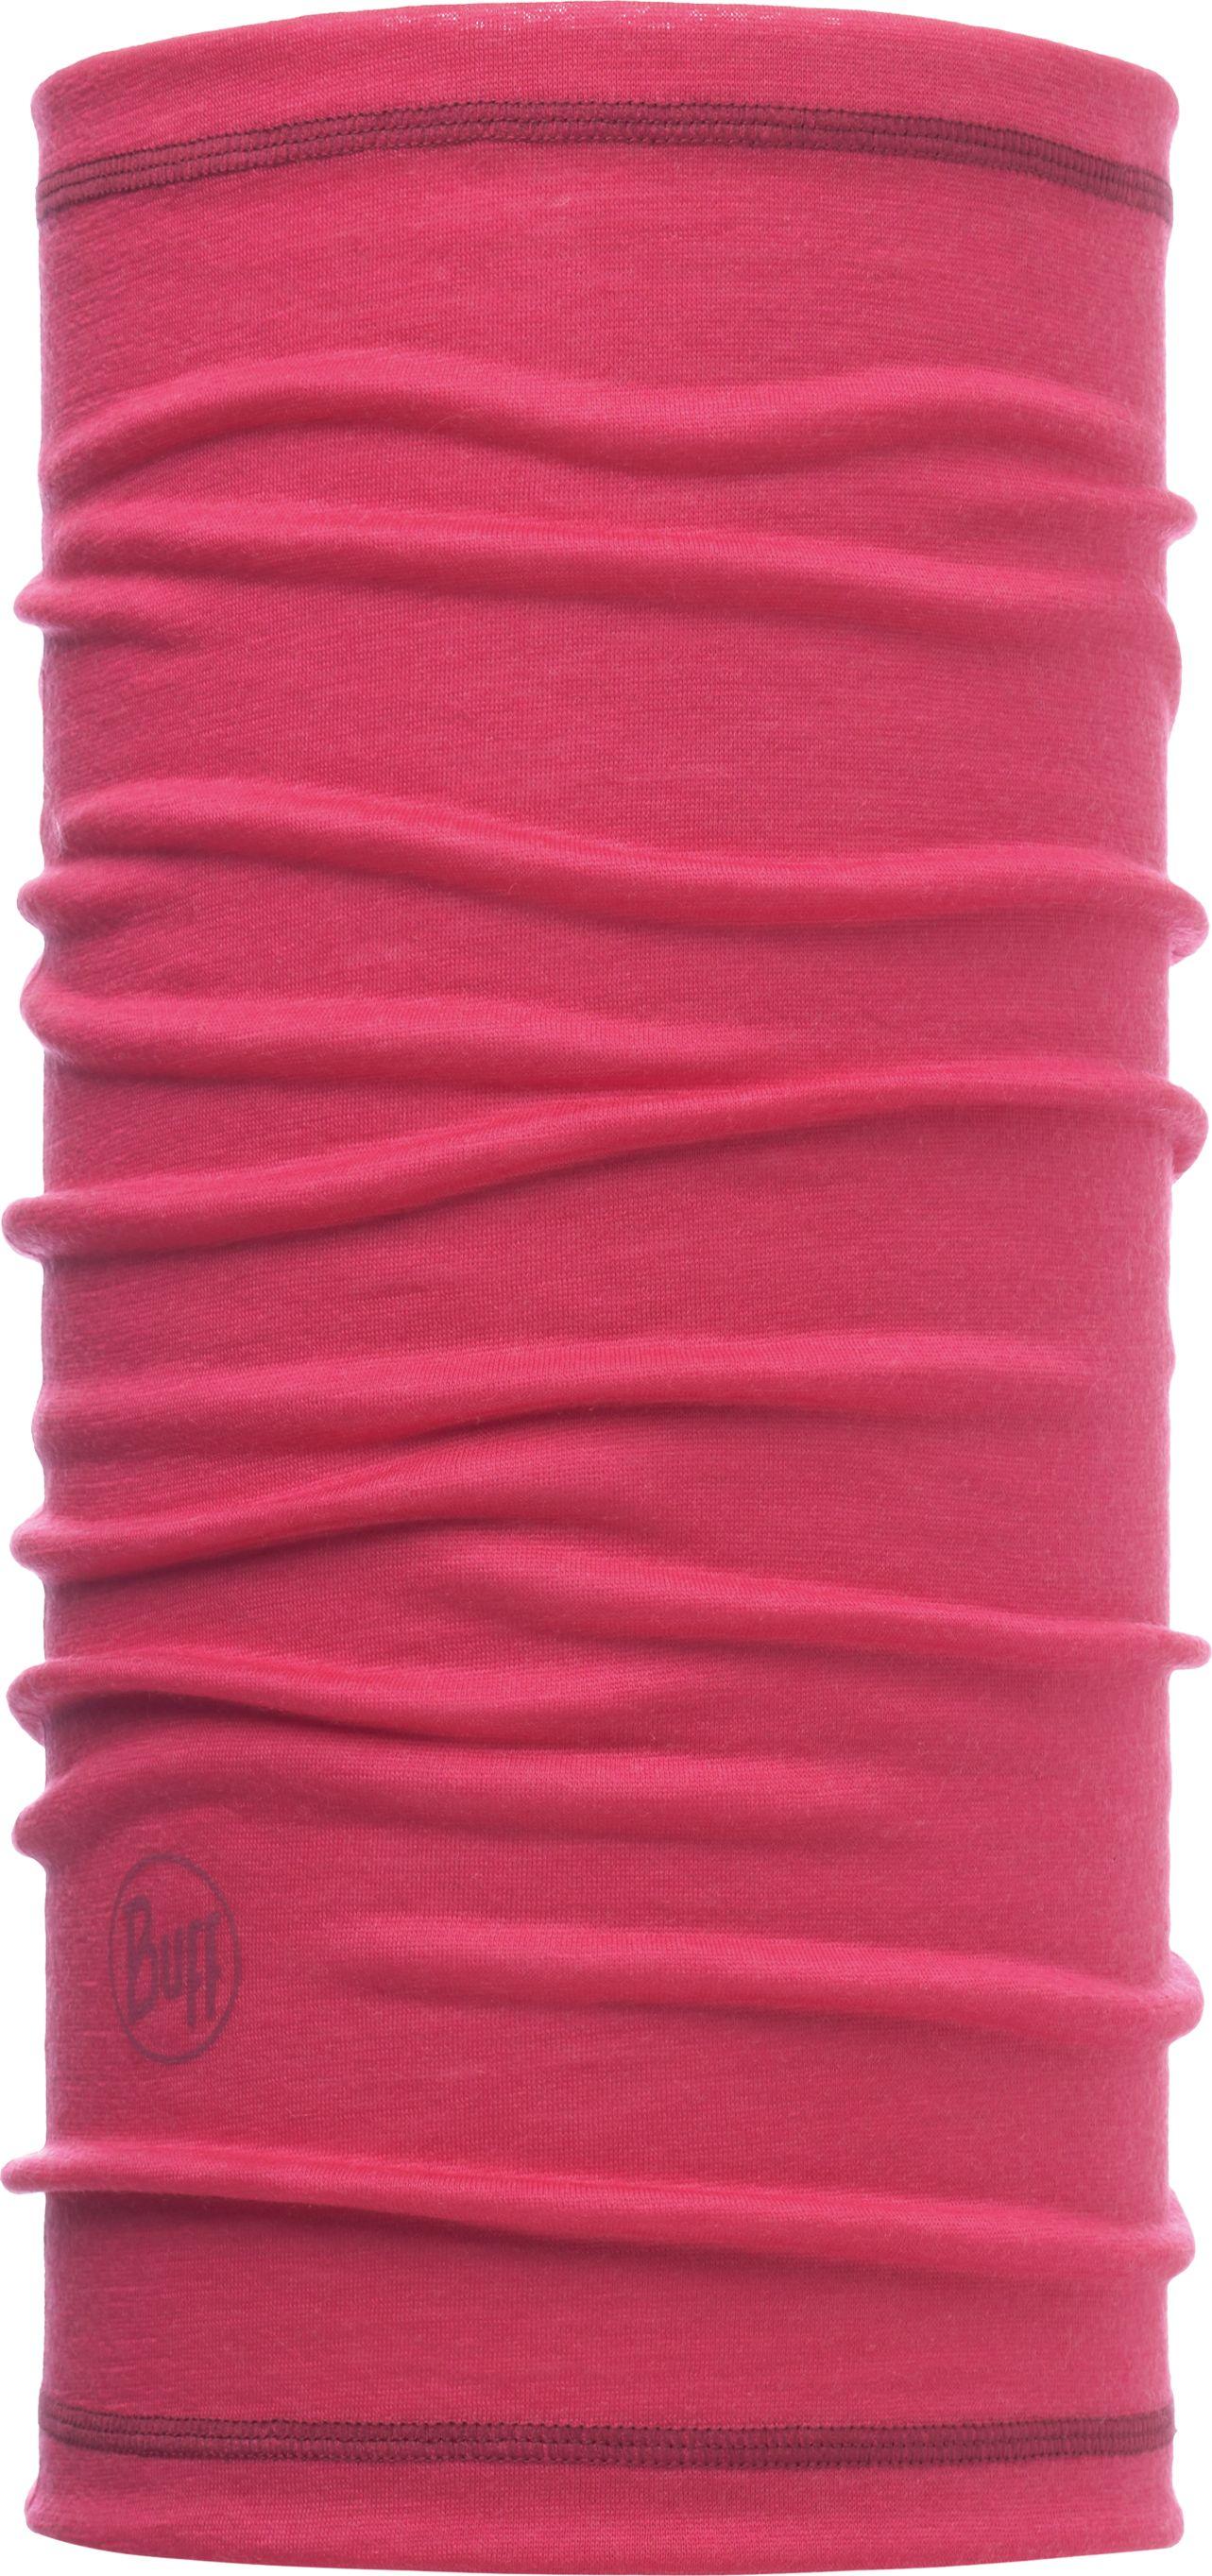 Бандана Buff 3/4 Lightweight Merino Wool Solid Wild Pink, цвет: розовый. 117064.540.10.00. Размер универсальный